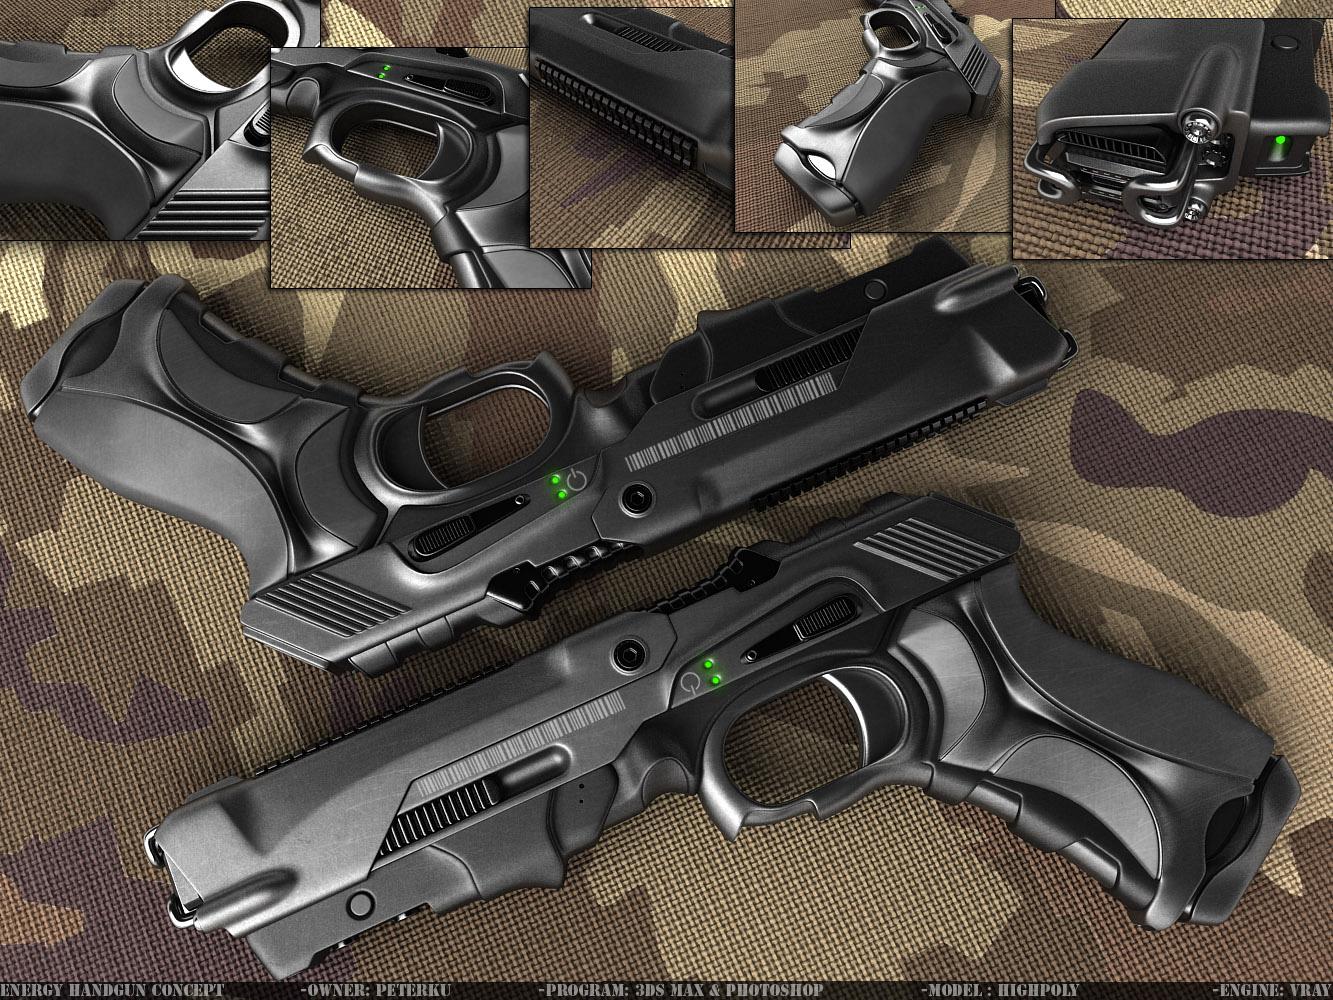 Appropriately Futuristic Guns - Page 4 - New Vegas Mod ...